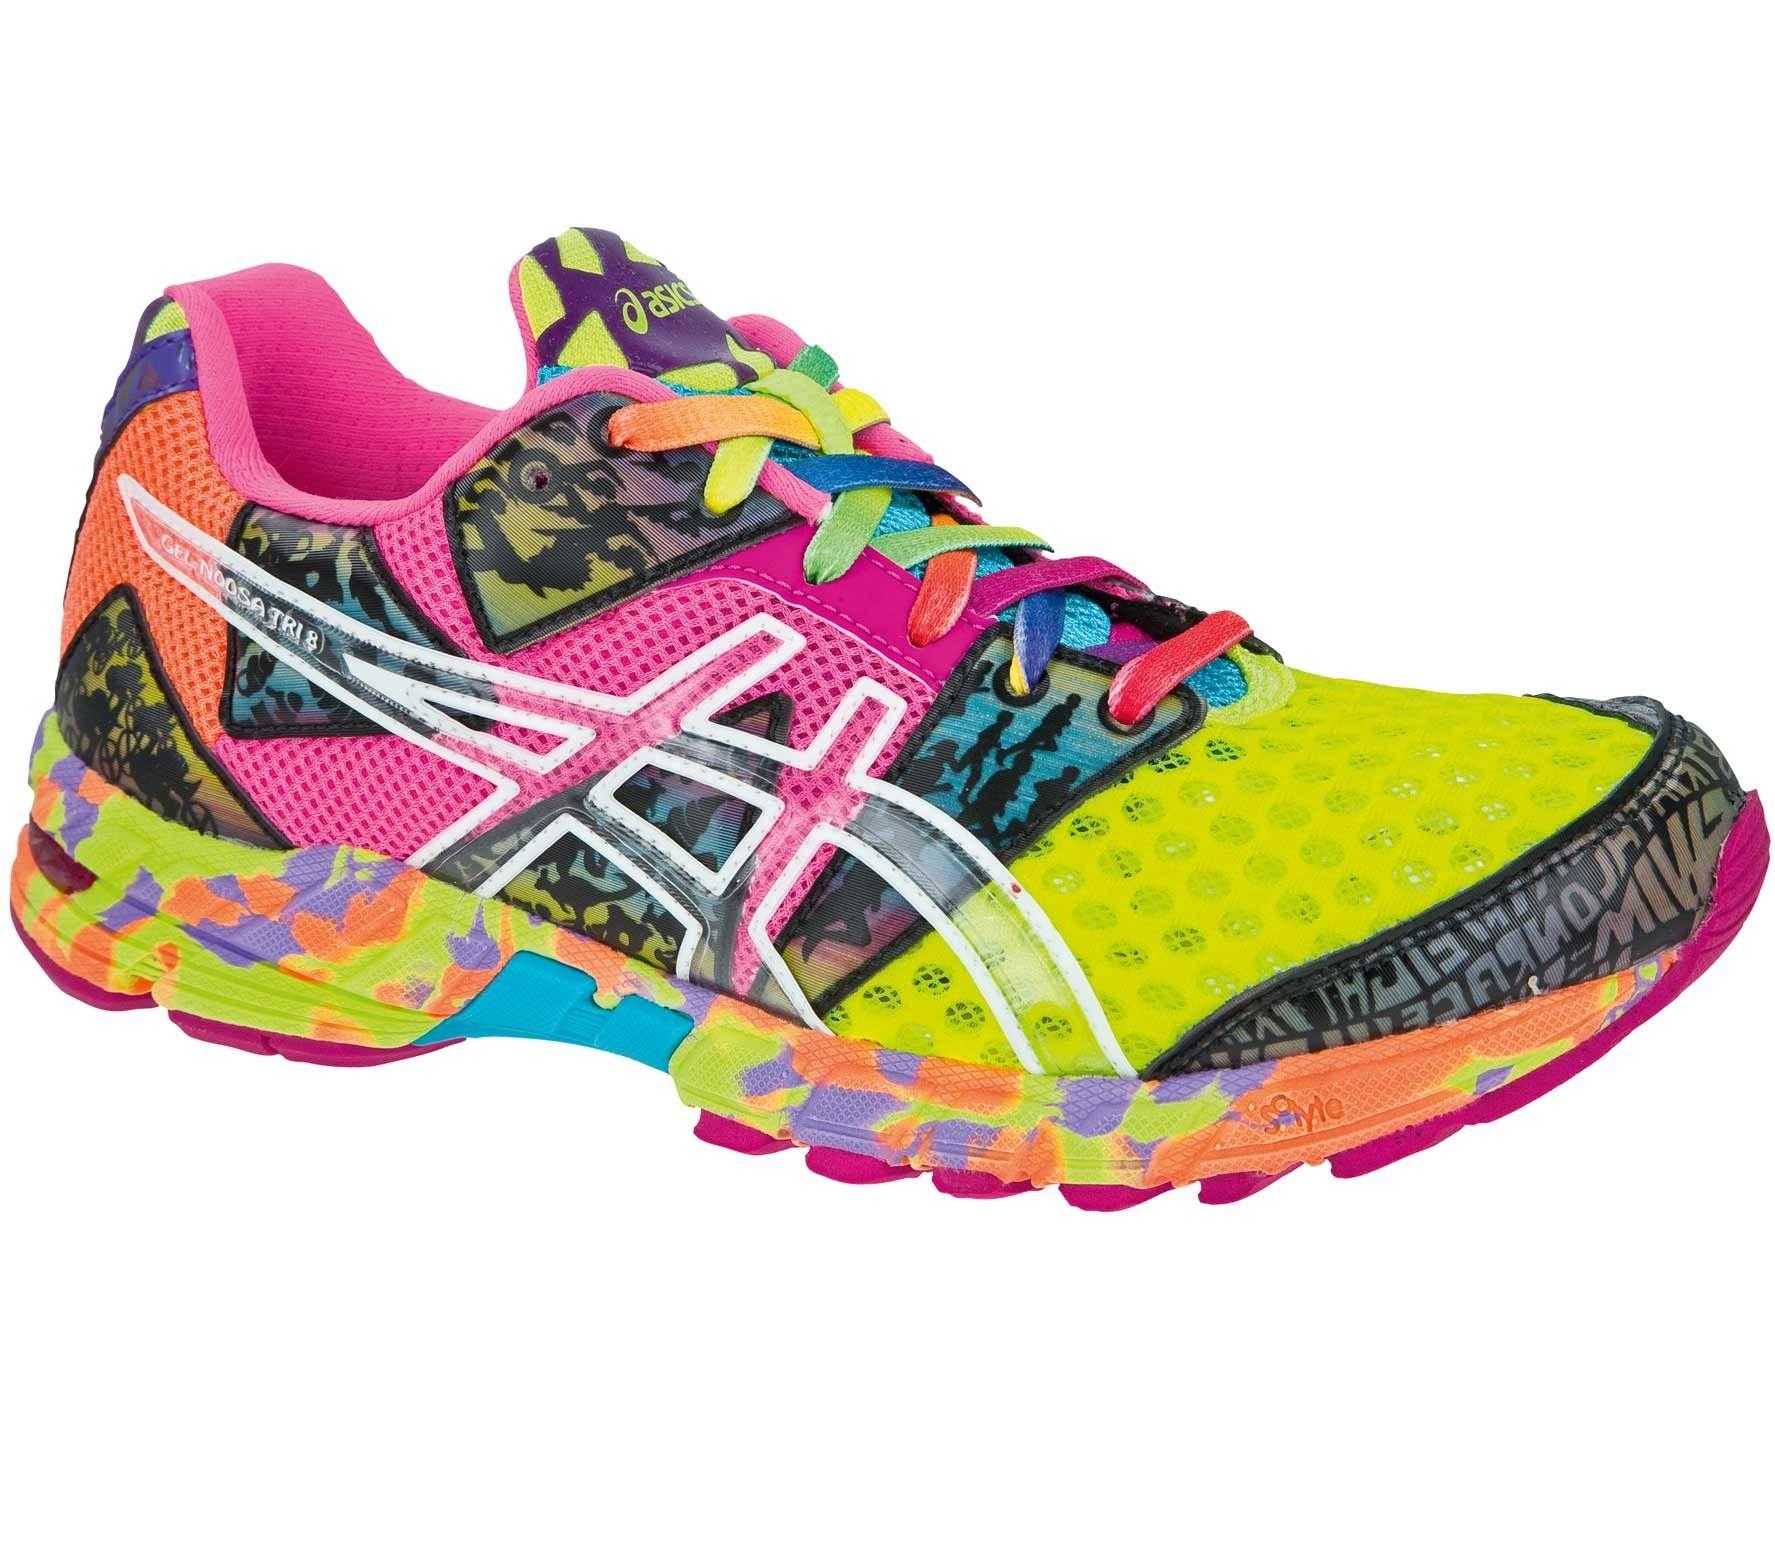 Asics - Running Shoes Women Gel-Noosa Tri 8 - FS13 Bought ...